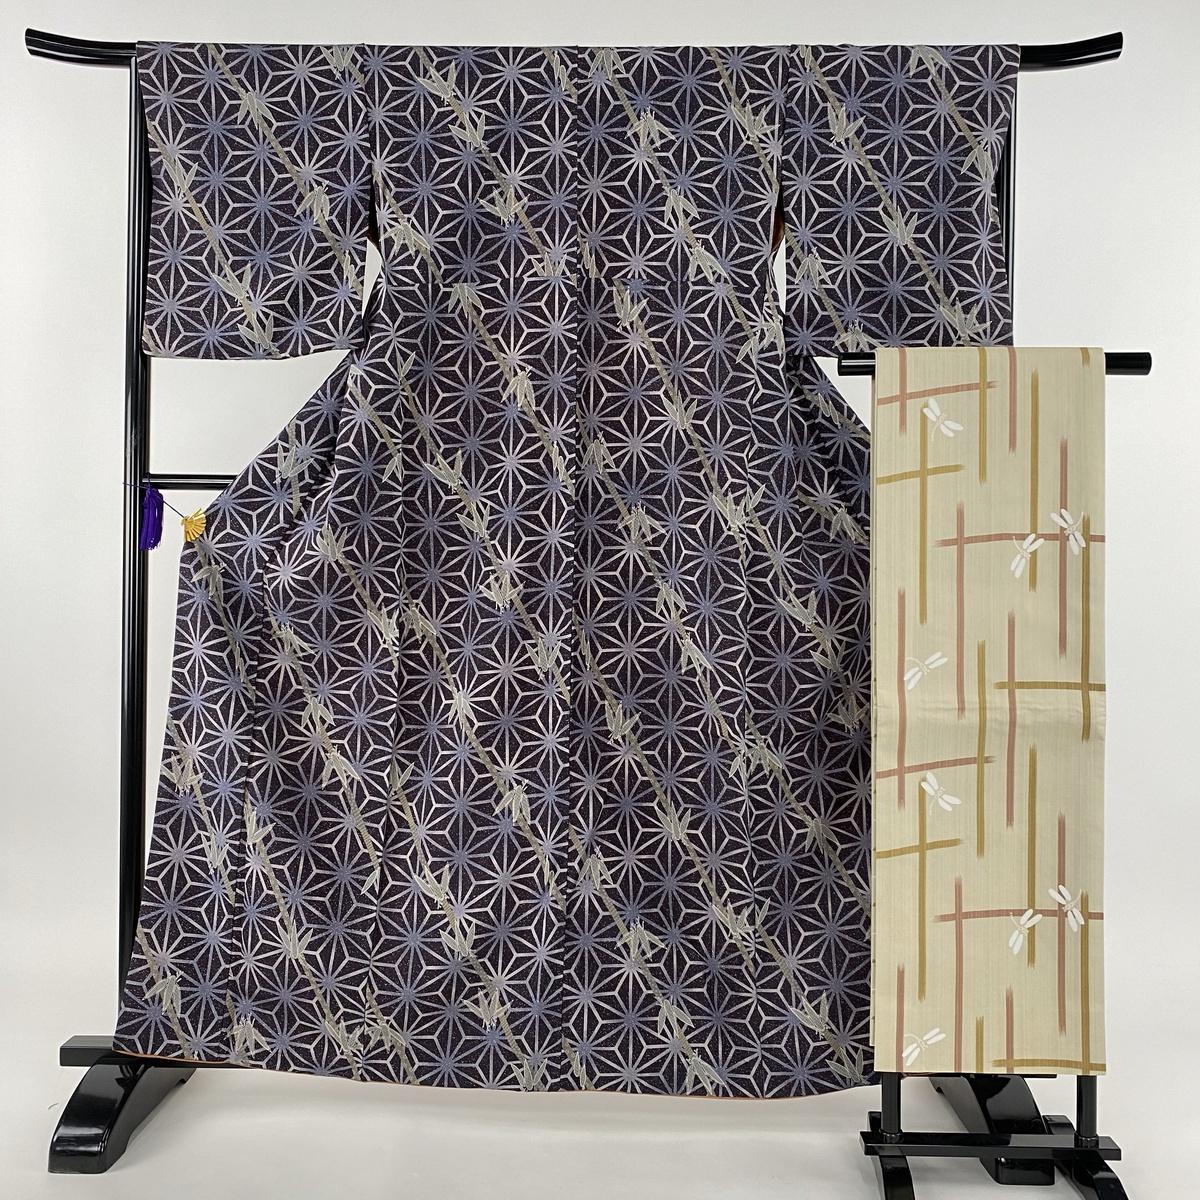 小紋 美品 優品 洗える着物 袋名古屋帯セット 麻の葉 笹 濃紫 袷 身丈162cm 裄丈67cm M 化繊 【中古】